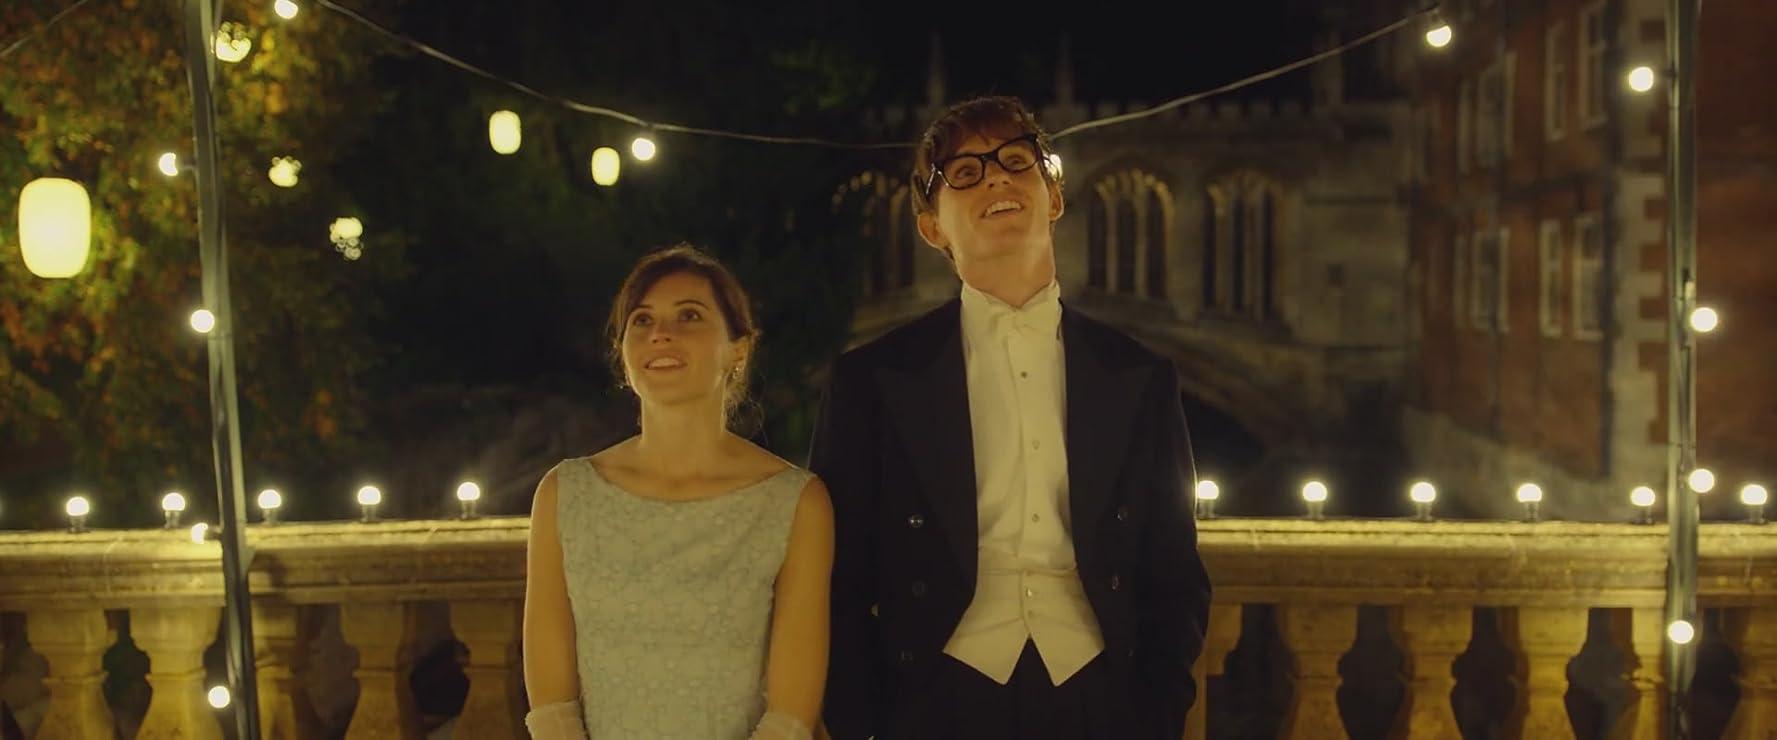 Felicity Jones dan Eddie Redmayne dalam The Theory of Everything (2014)